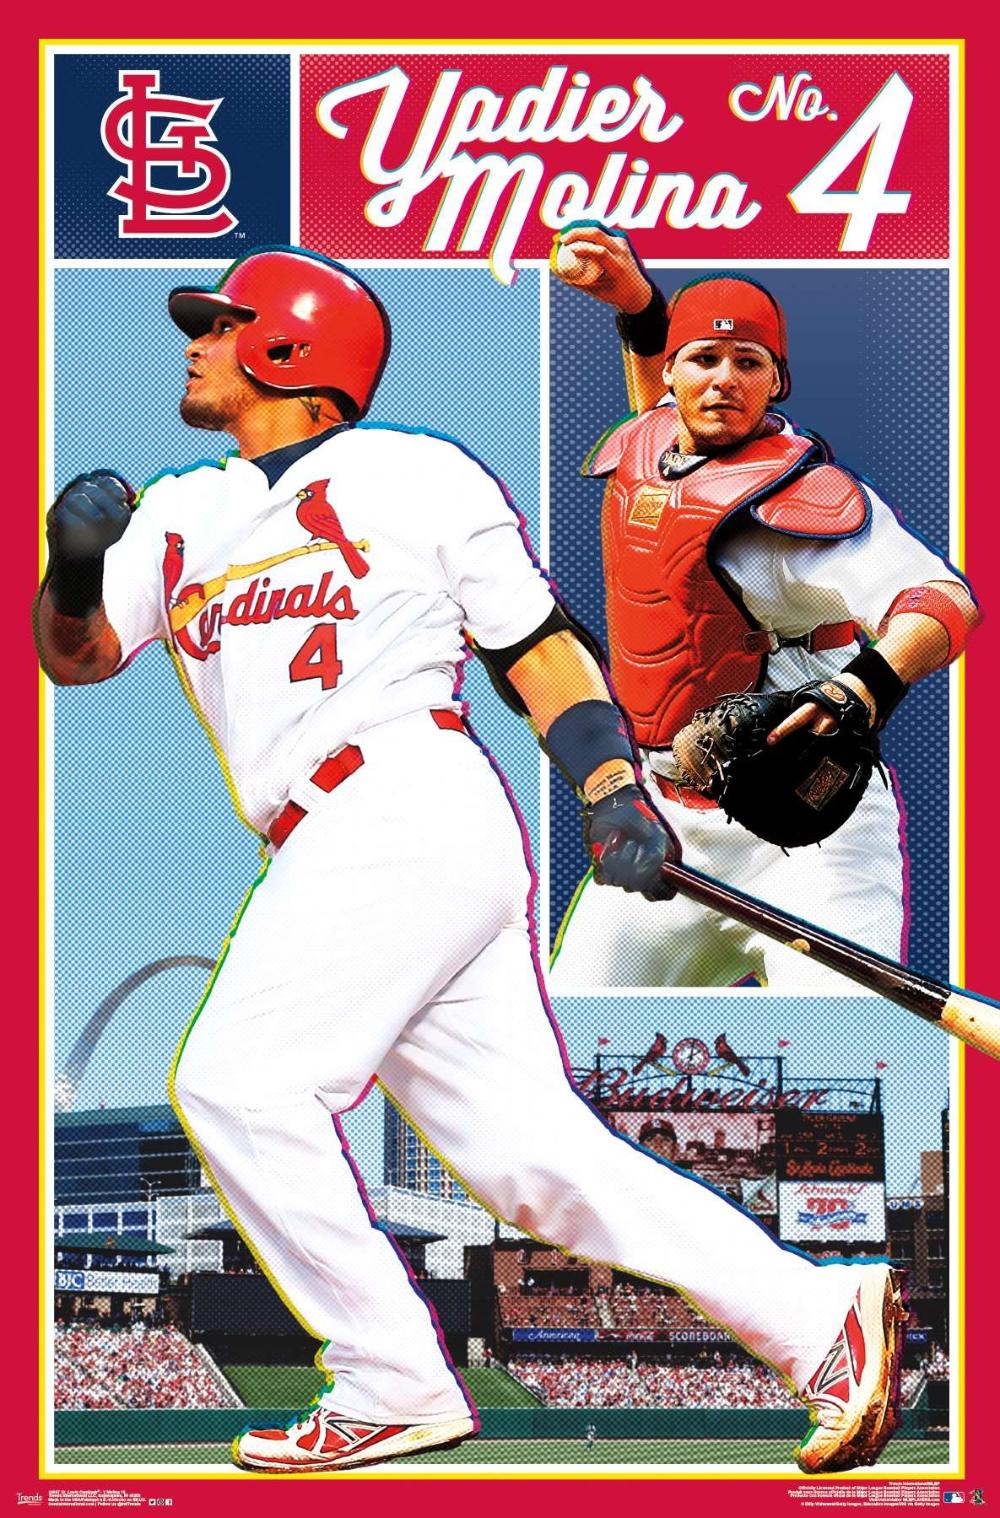 Mlb St Louis Cardinals Yadier Molina In 2020 St Louis Cardinals Baseball Baseball Posters Yadier Molina